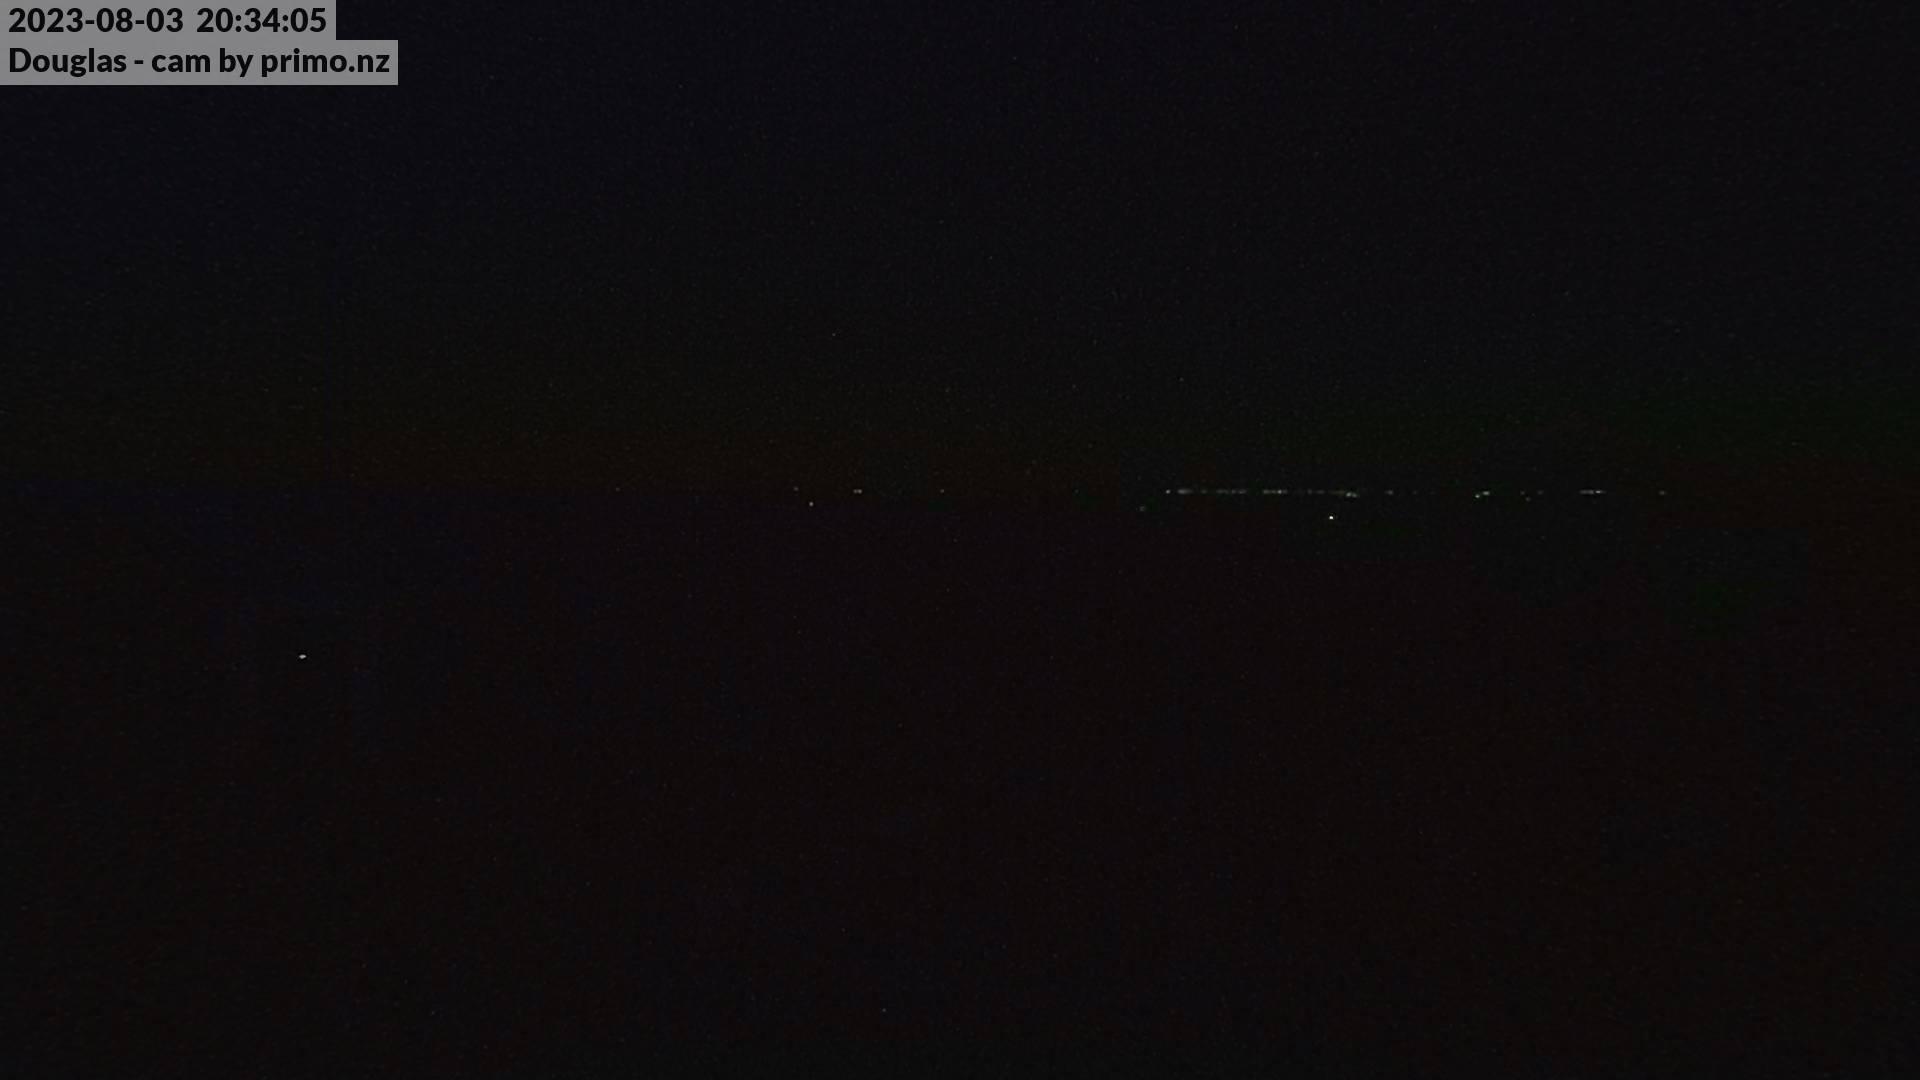 Douglas, Taranaki, NZ